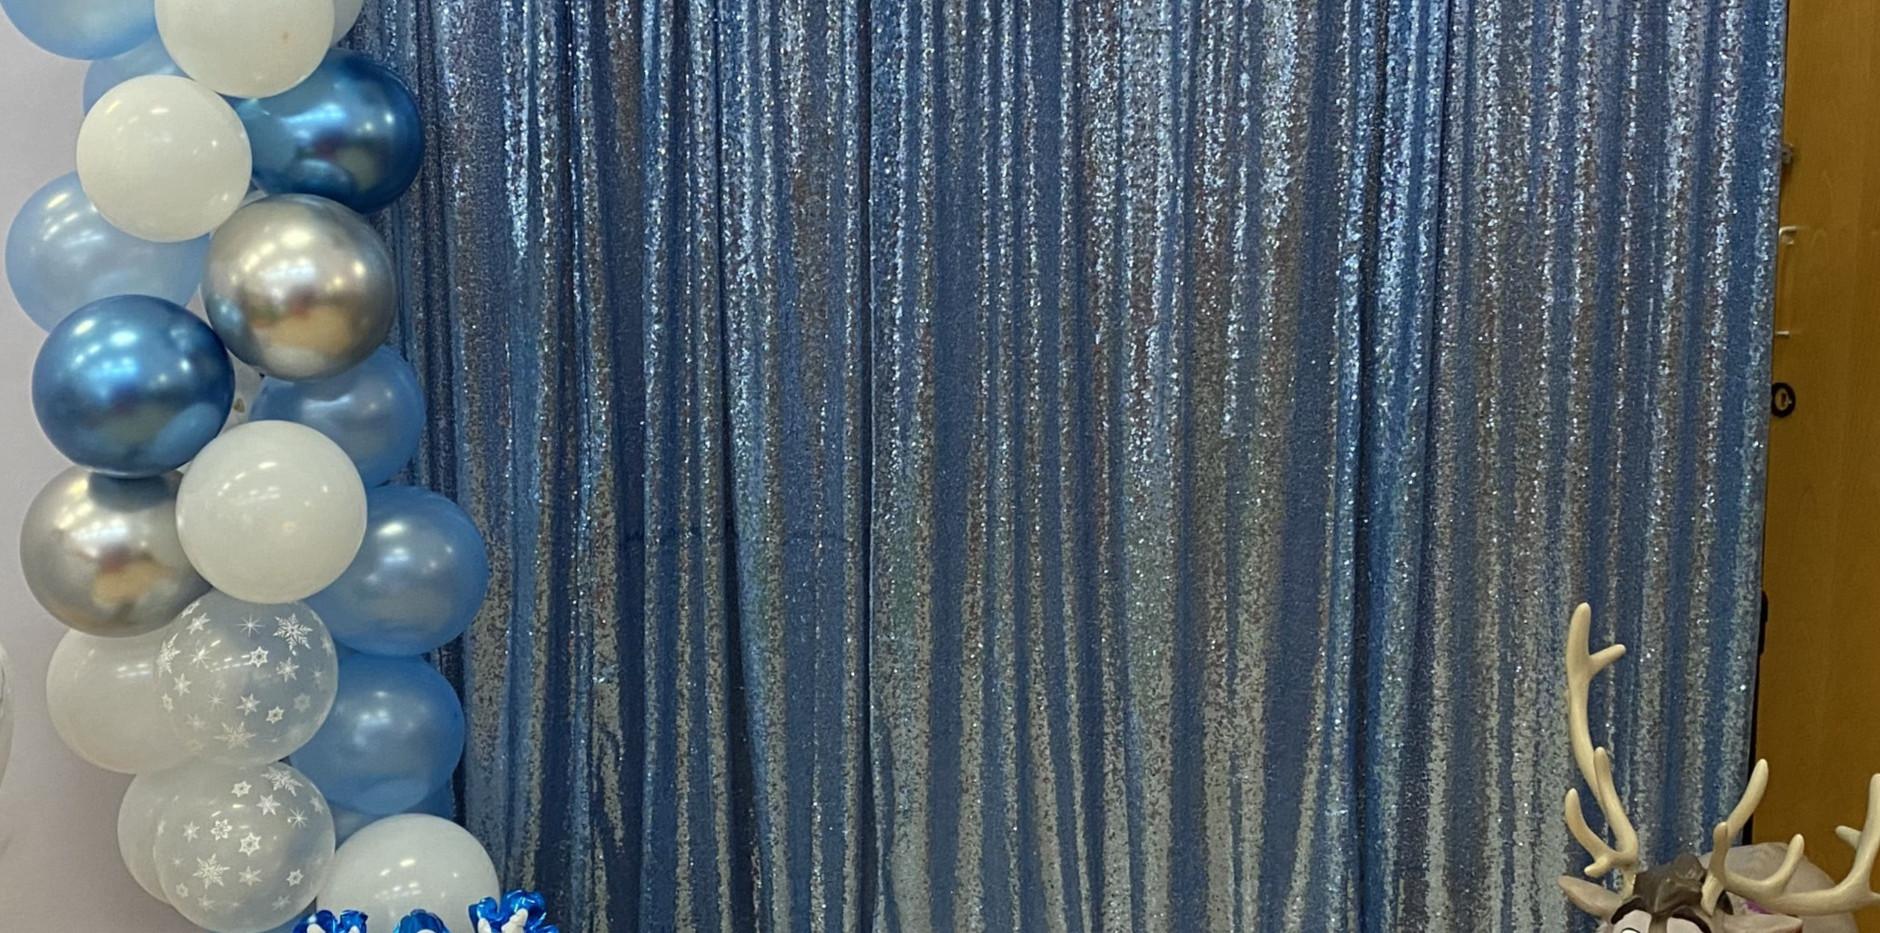 Blue Sequin Curtain Backdrop